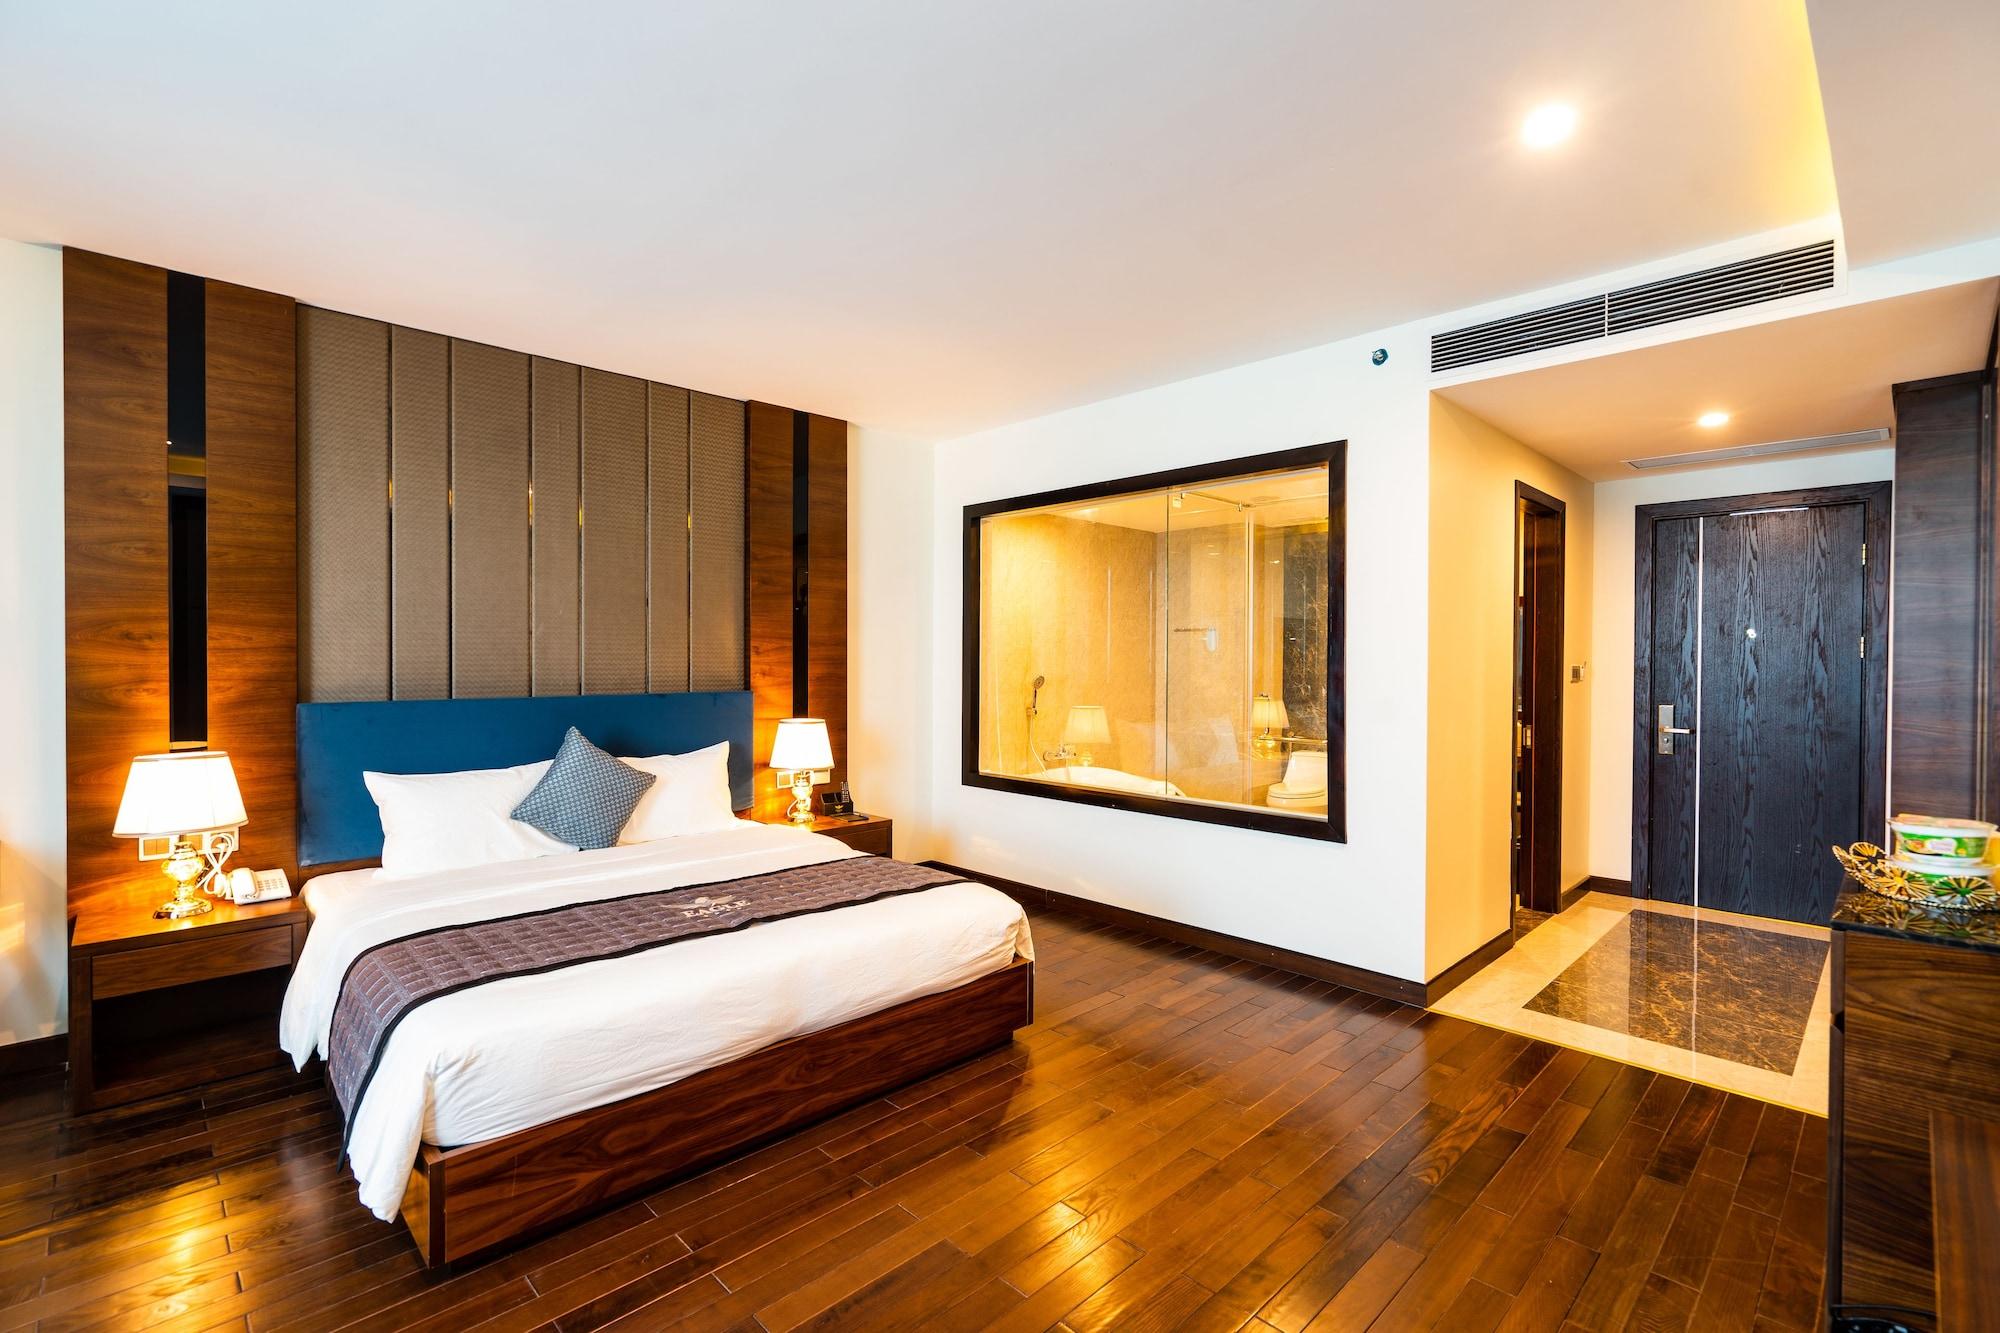 Eagle Hotel, Hà Tĩnh